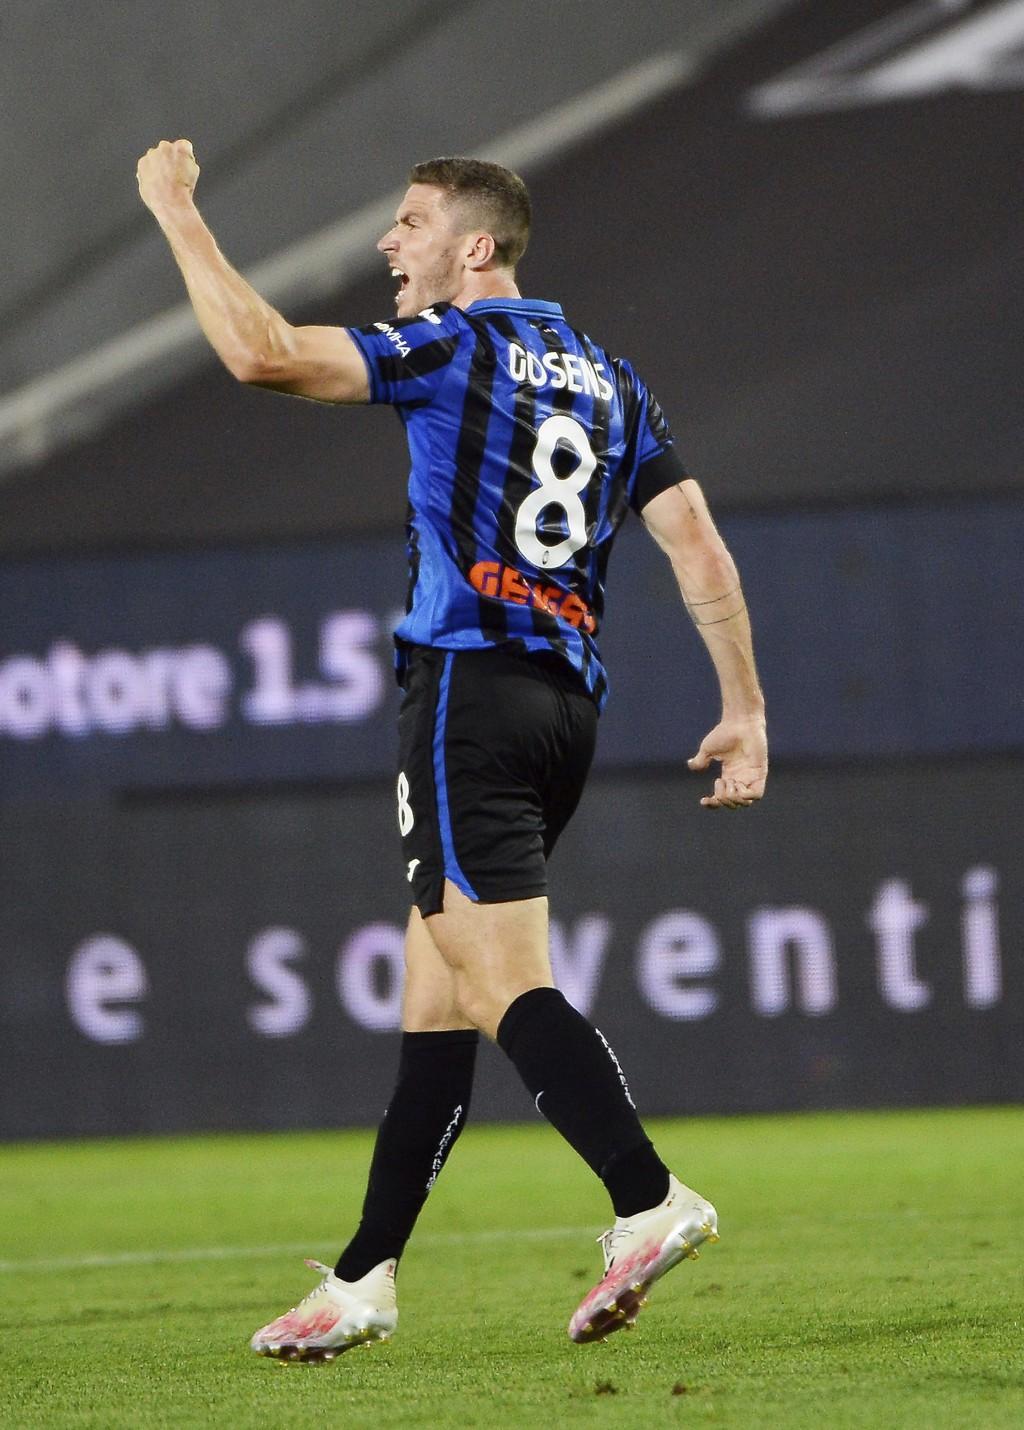 Atalanta's Robin Gosens celebrates after scoring a goal during a Serie A soccer match between Atalanta and Lazio, at the Gewiss Stadium in Bergamo, It...